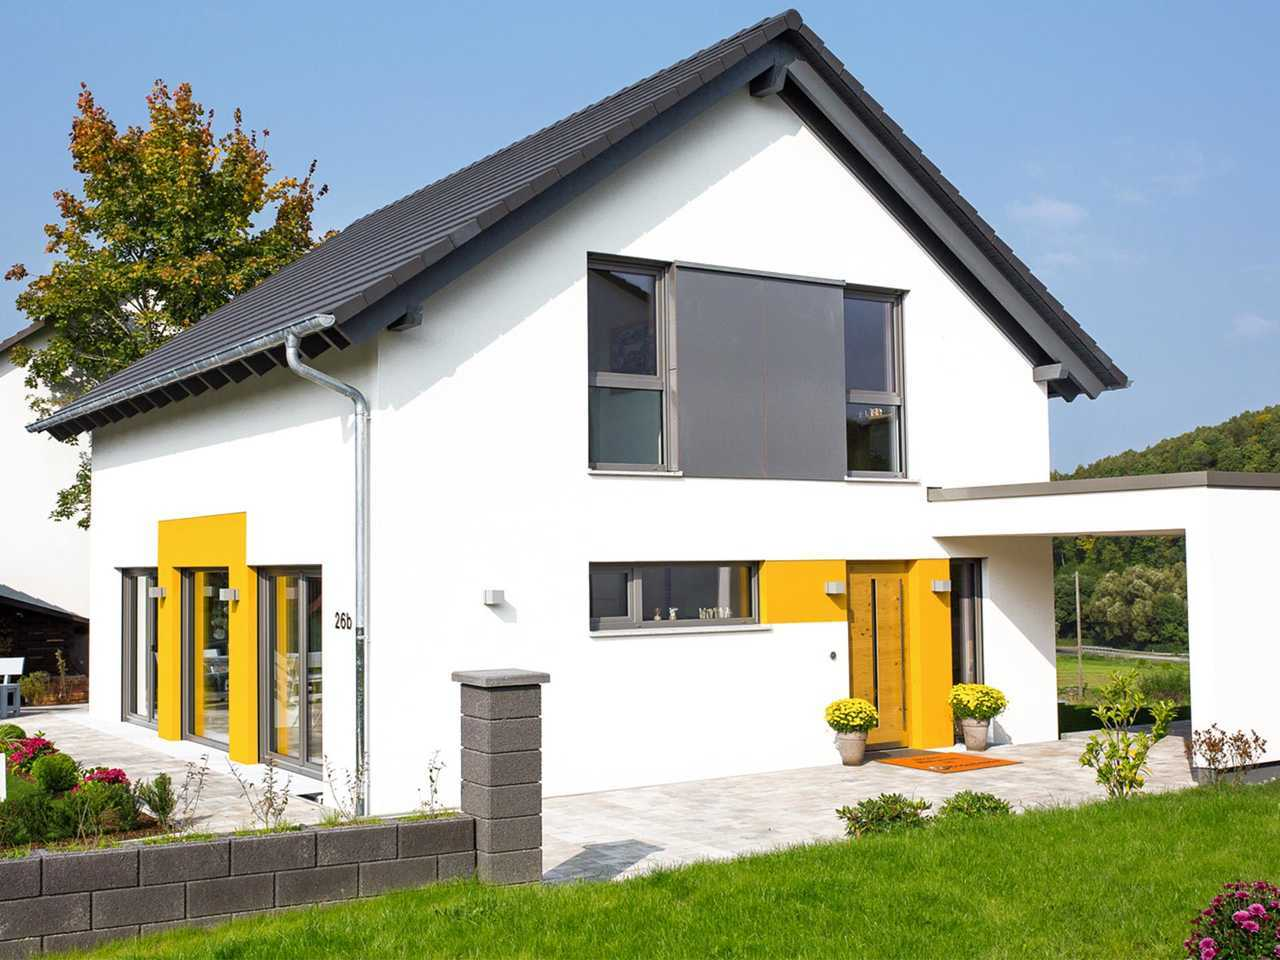 Musterhaus Jedermann® - Büdenbender Hausbau